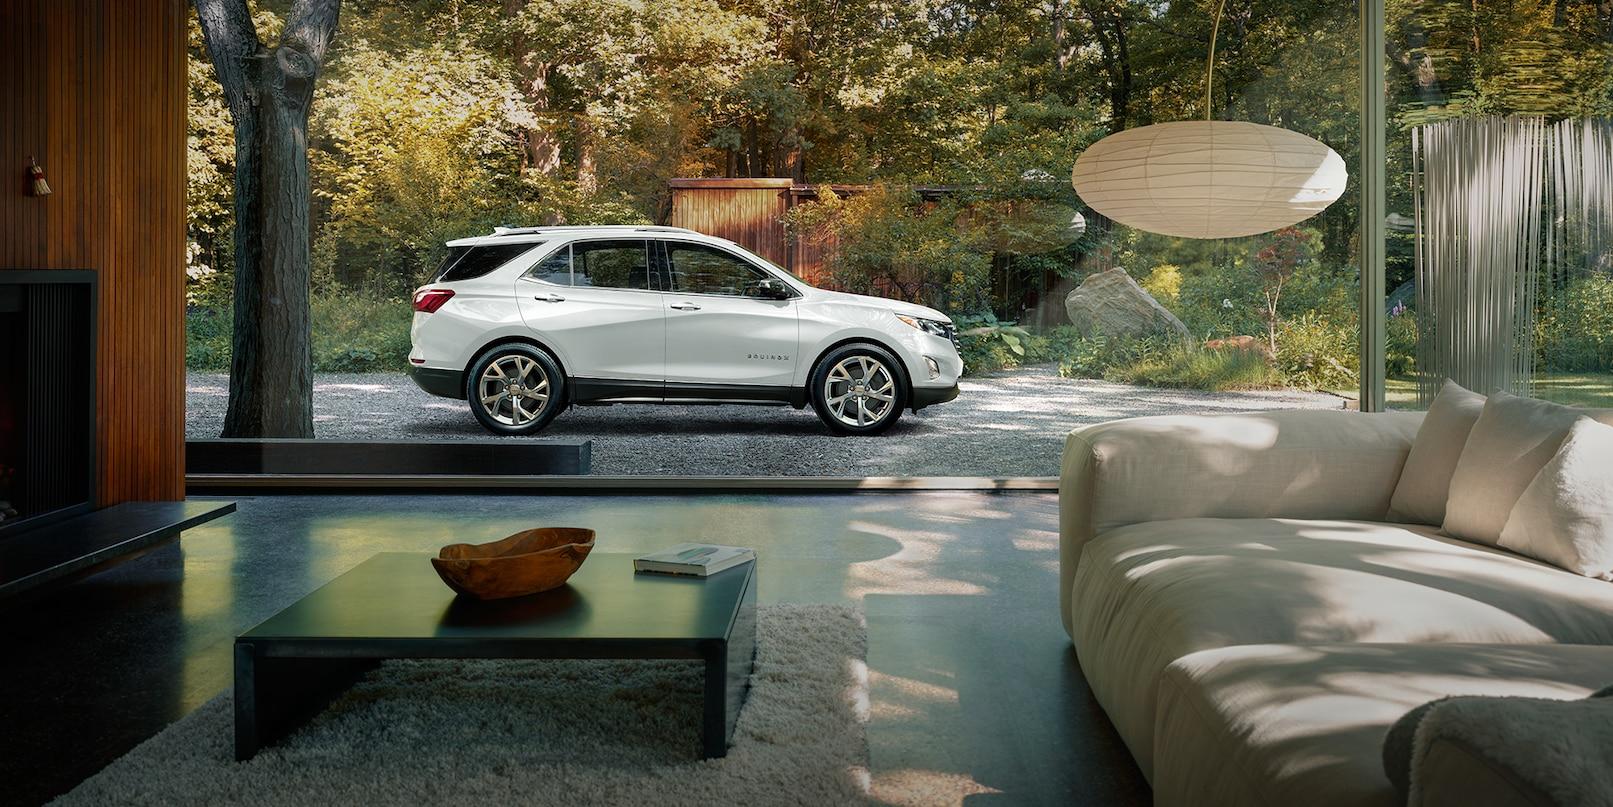 2019 Chevrolet Equinox Financing near Mobile, AL